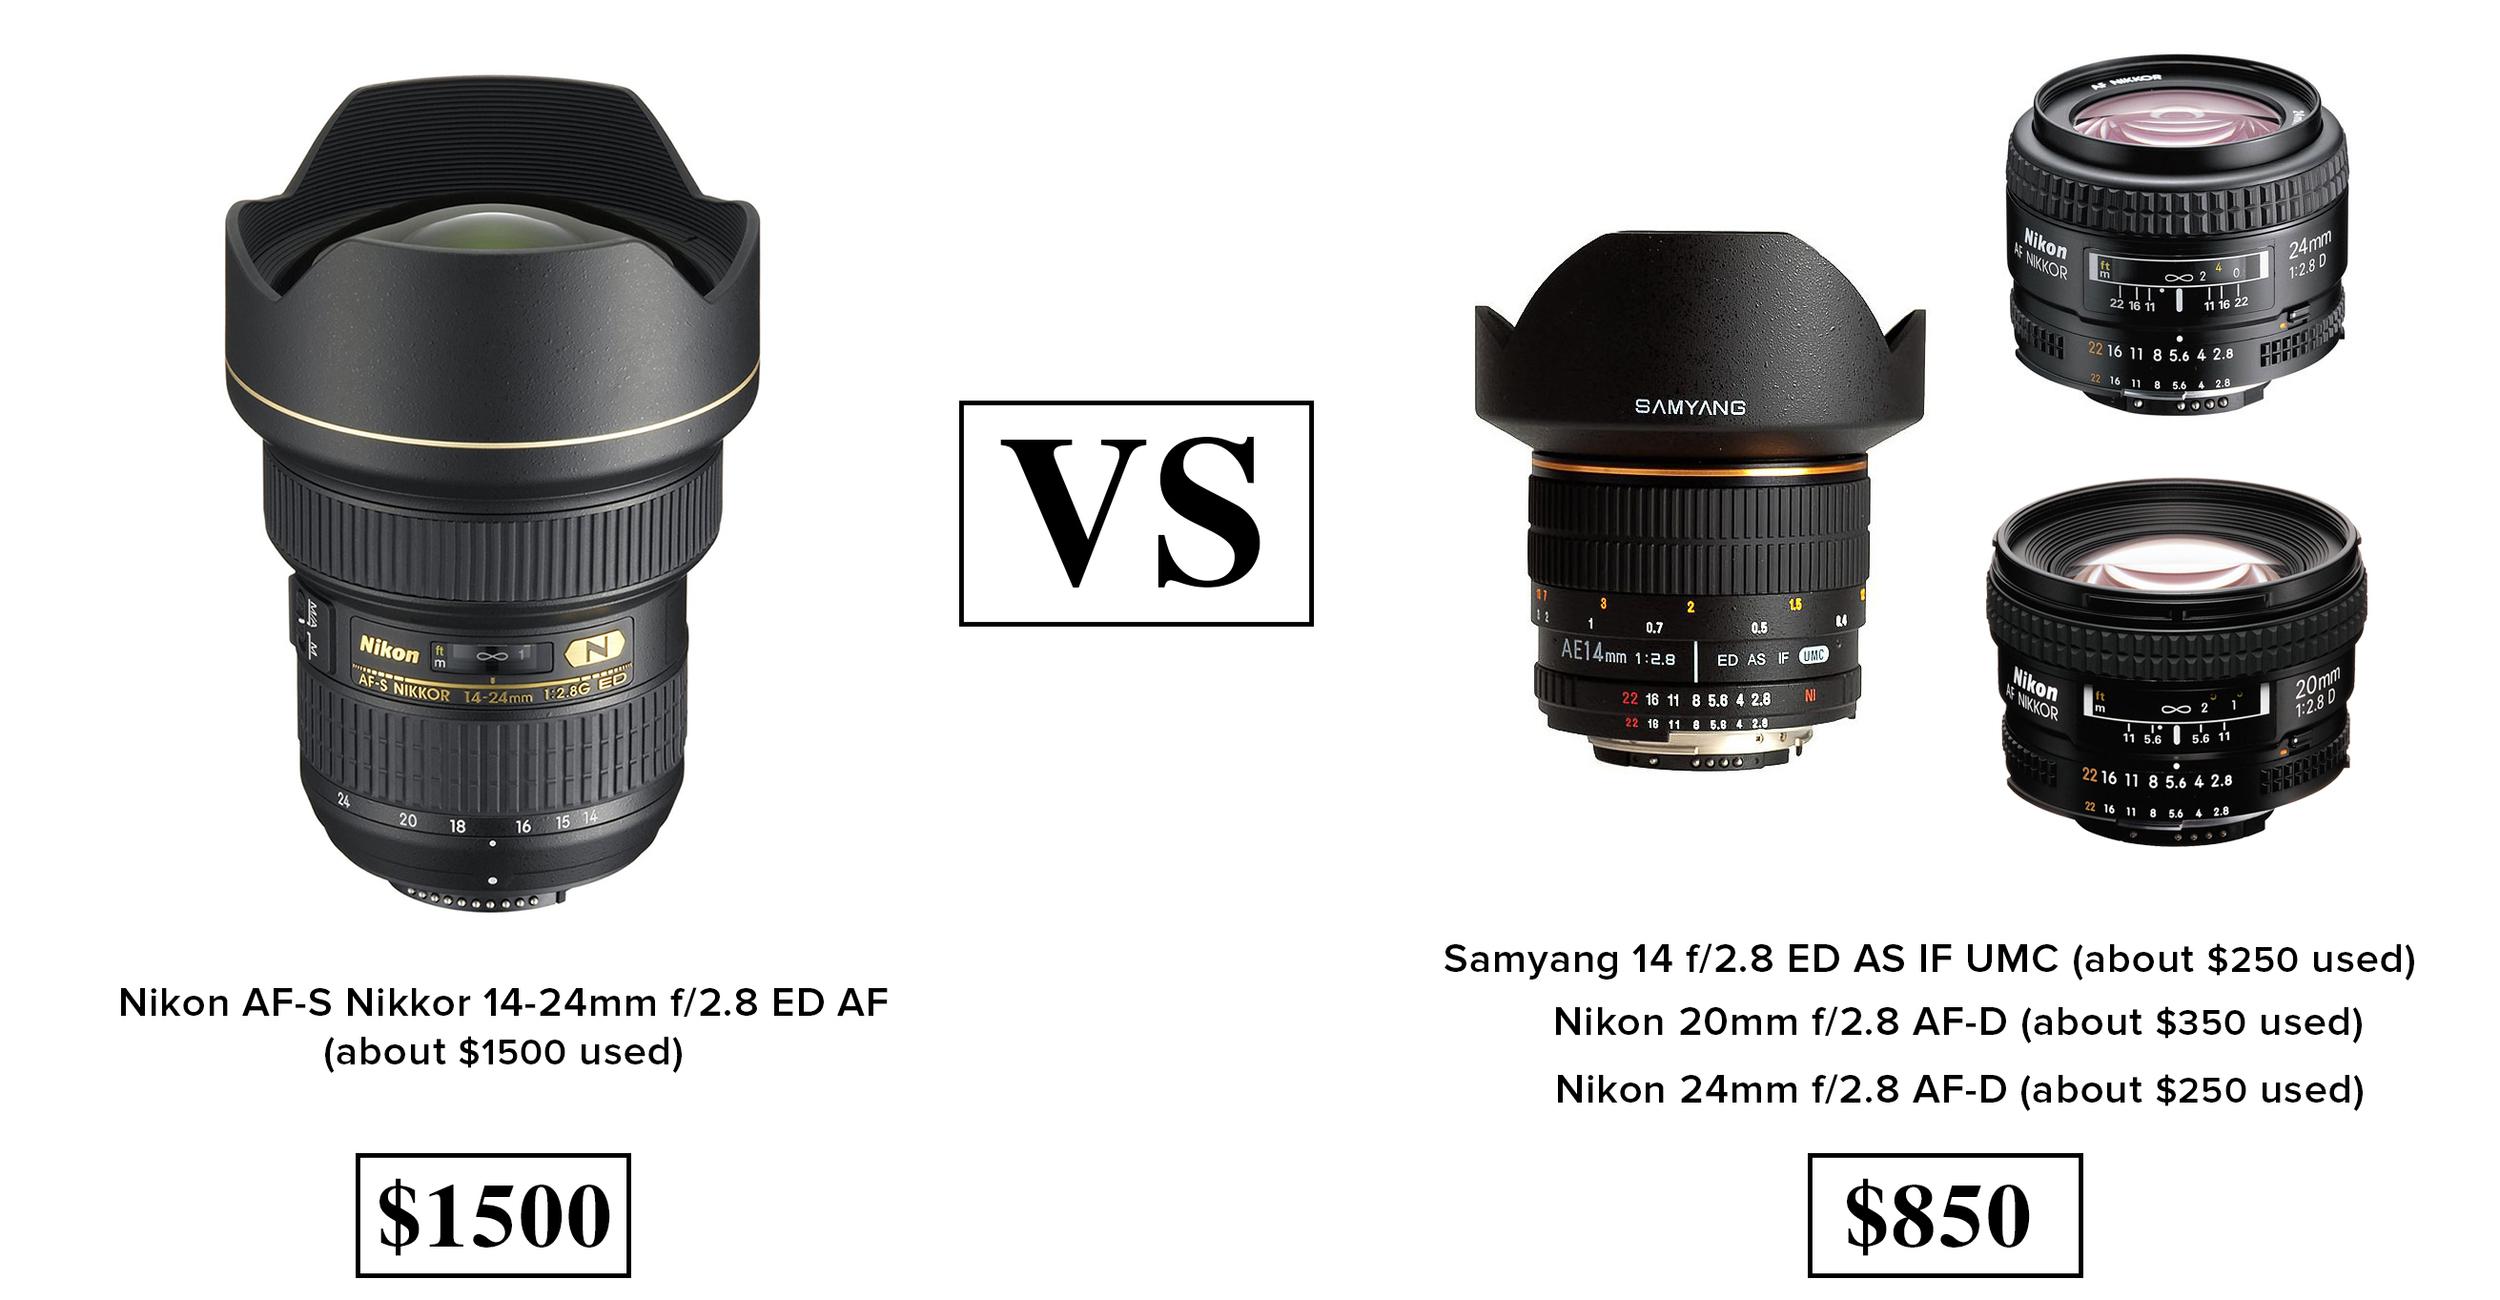 Nikon 14-24 f/2.8 vs 3 equivalent primes for less money. Nikon 24mm f/2.8, Nikon 20mm f/2.8, Samyang 14mm f/2.8.